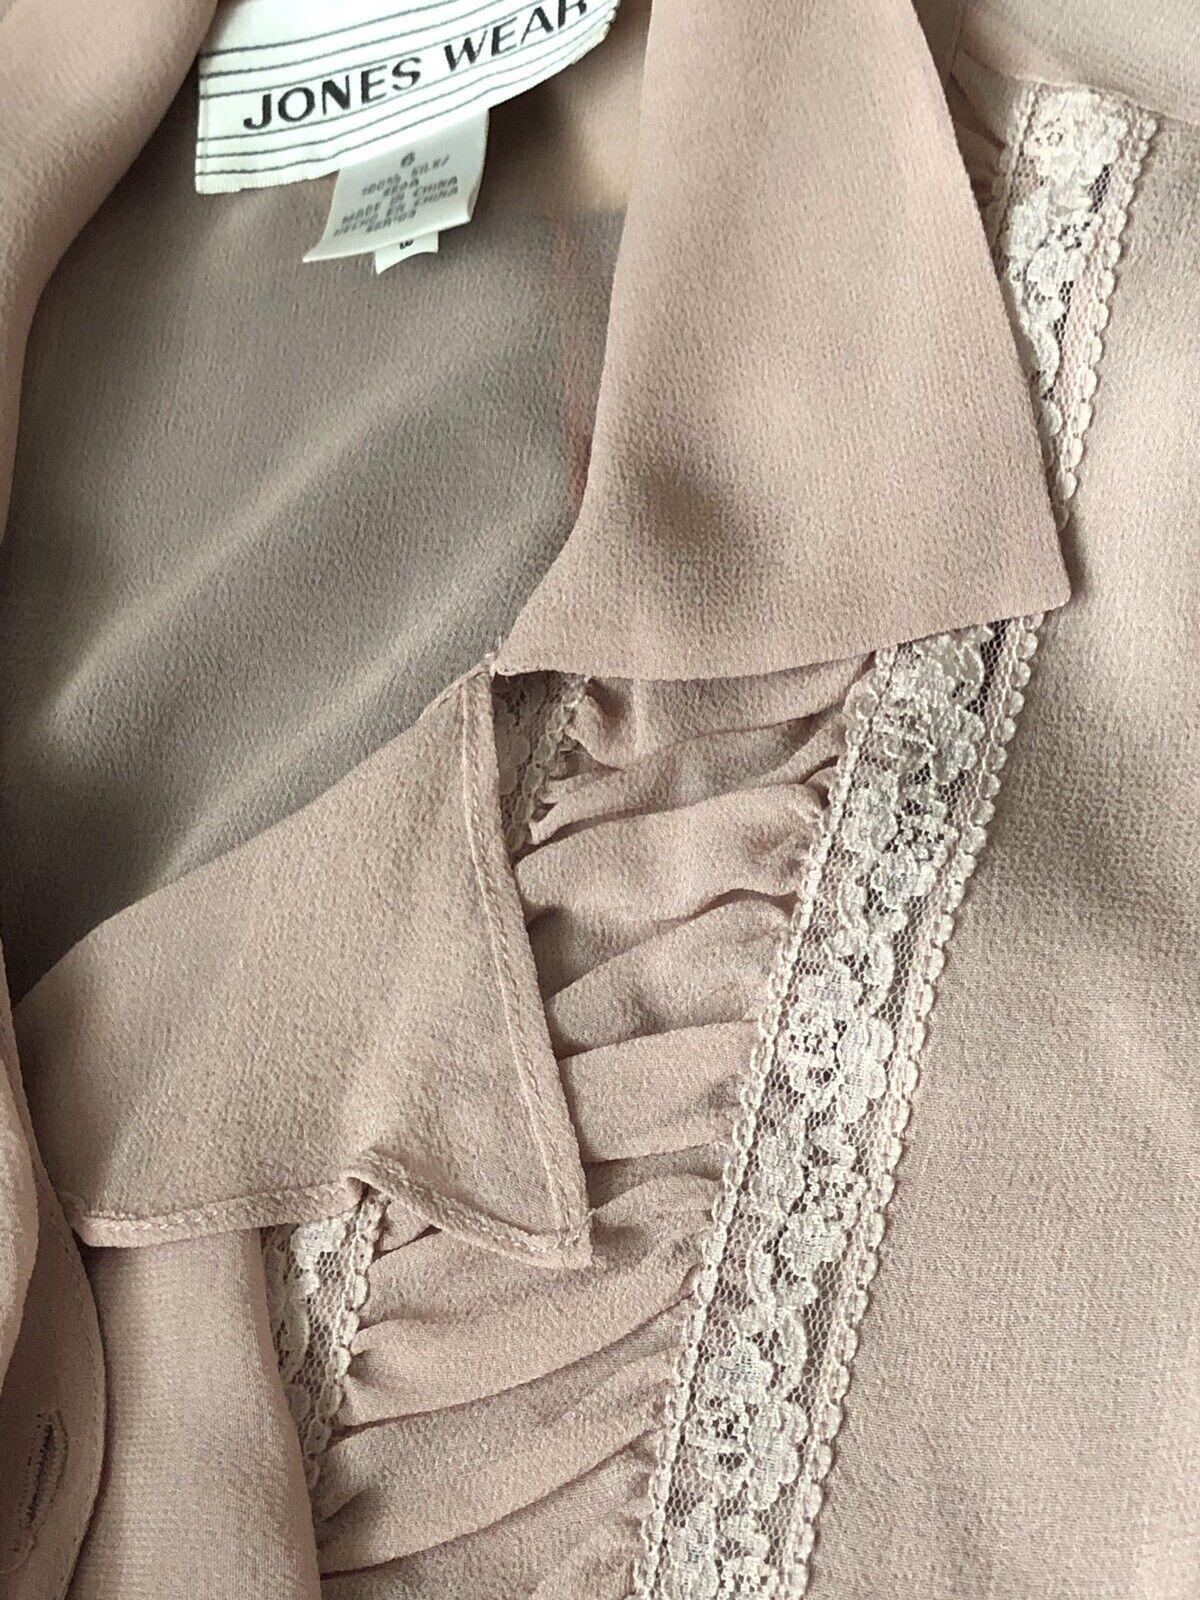 Vintage Stunning Jones Wear Silk Sheer Dusty Lila… - image 9